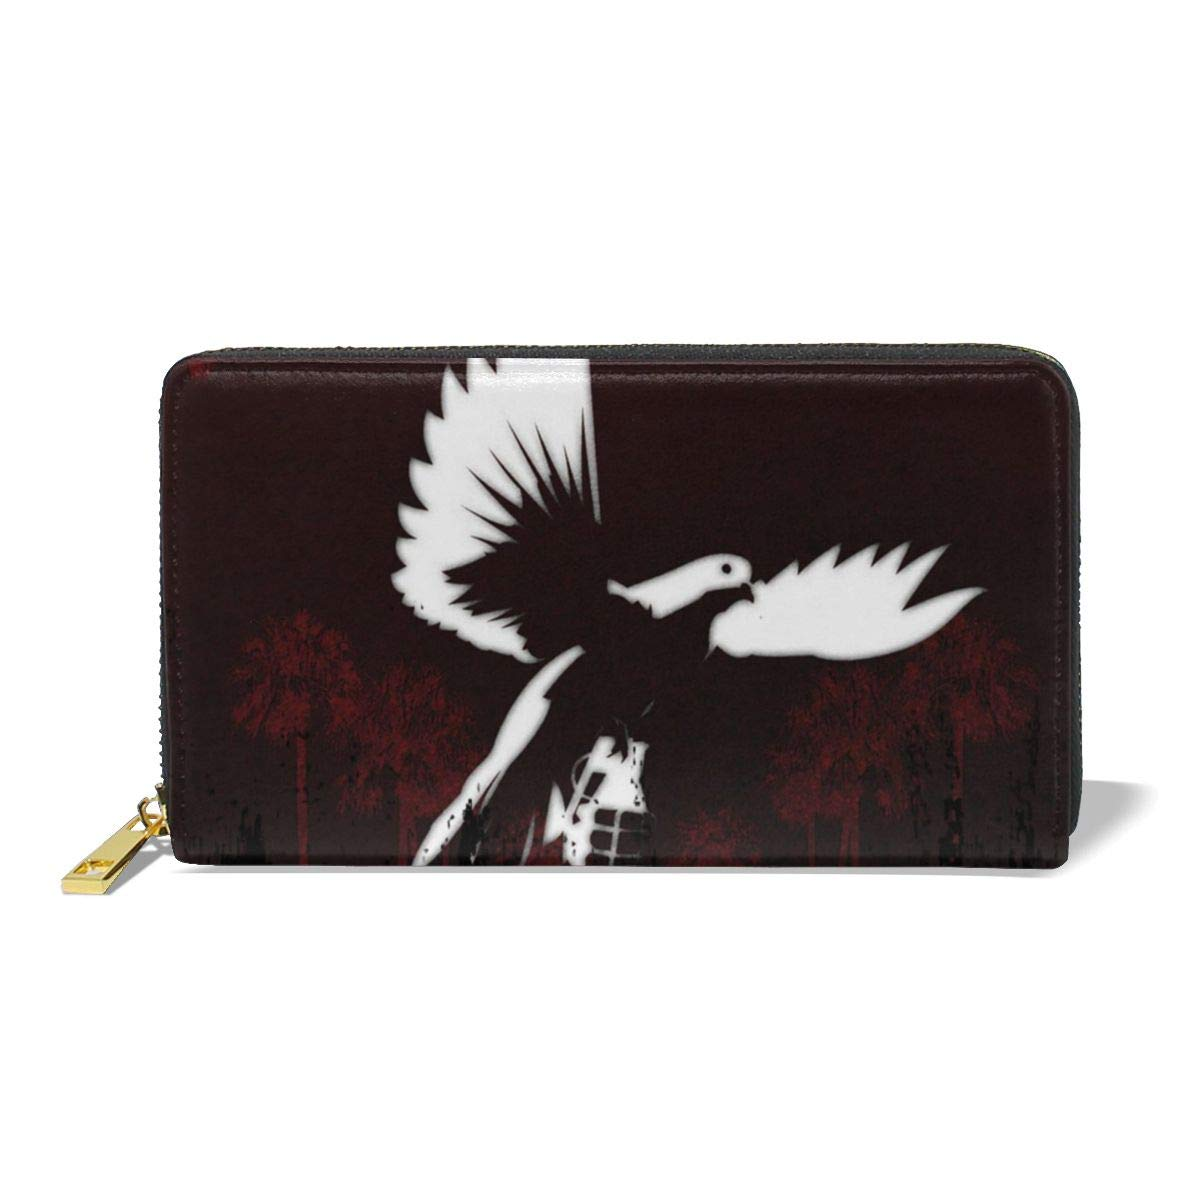 XJLGGMHDS Hollywood Undead Unisex Wallet Zipper Closure Card Slots Zippered Coin Pouch